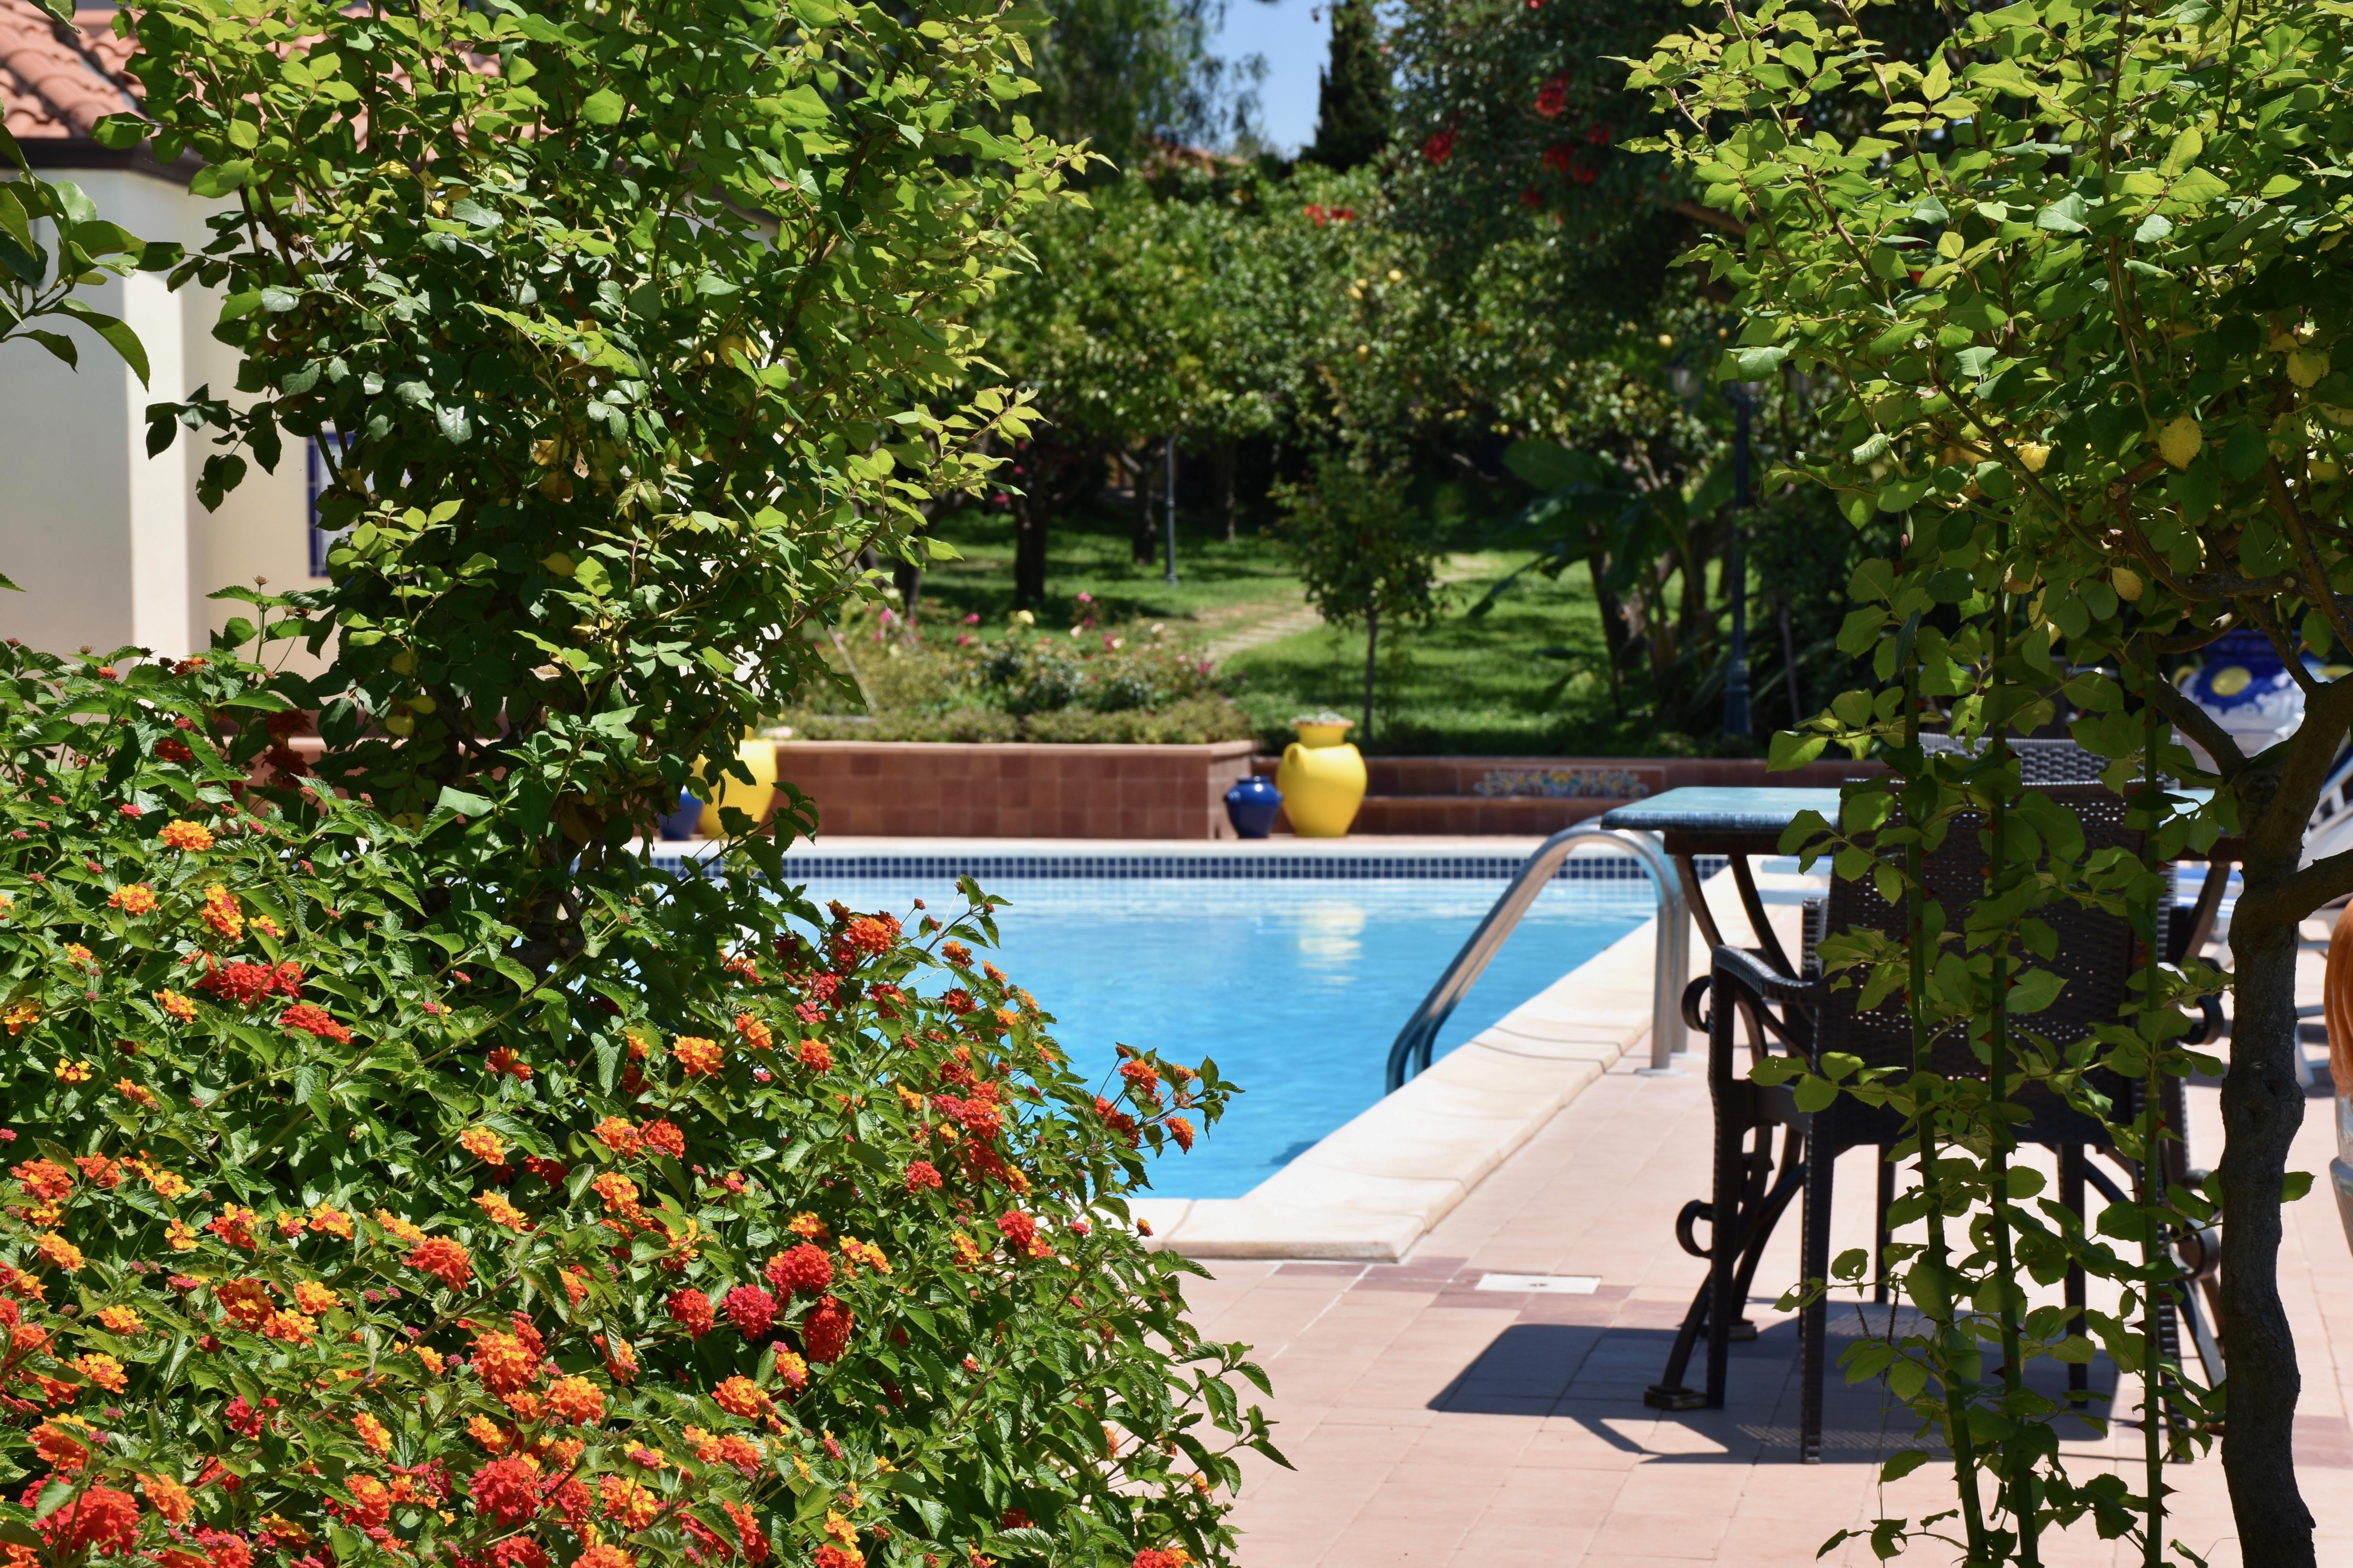 La piscina 6